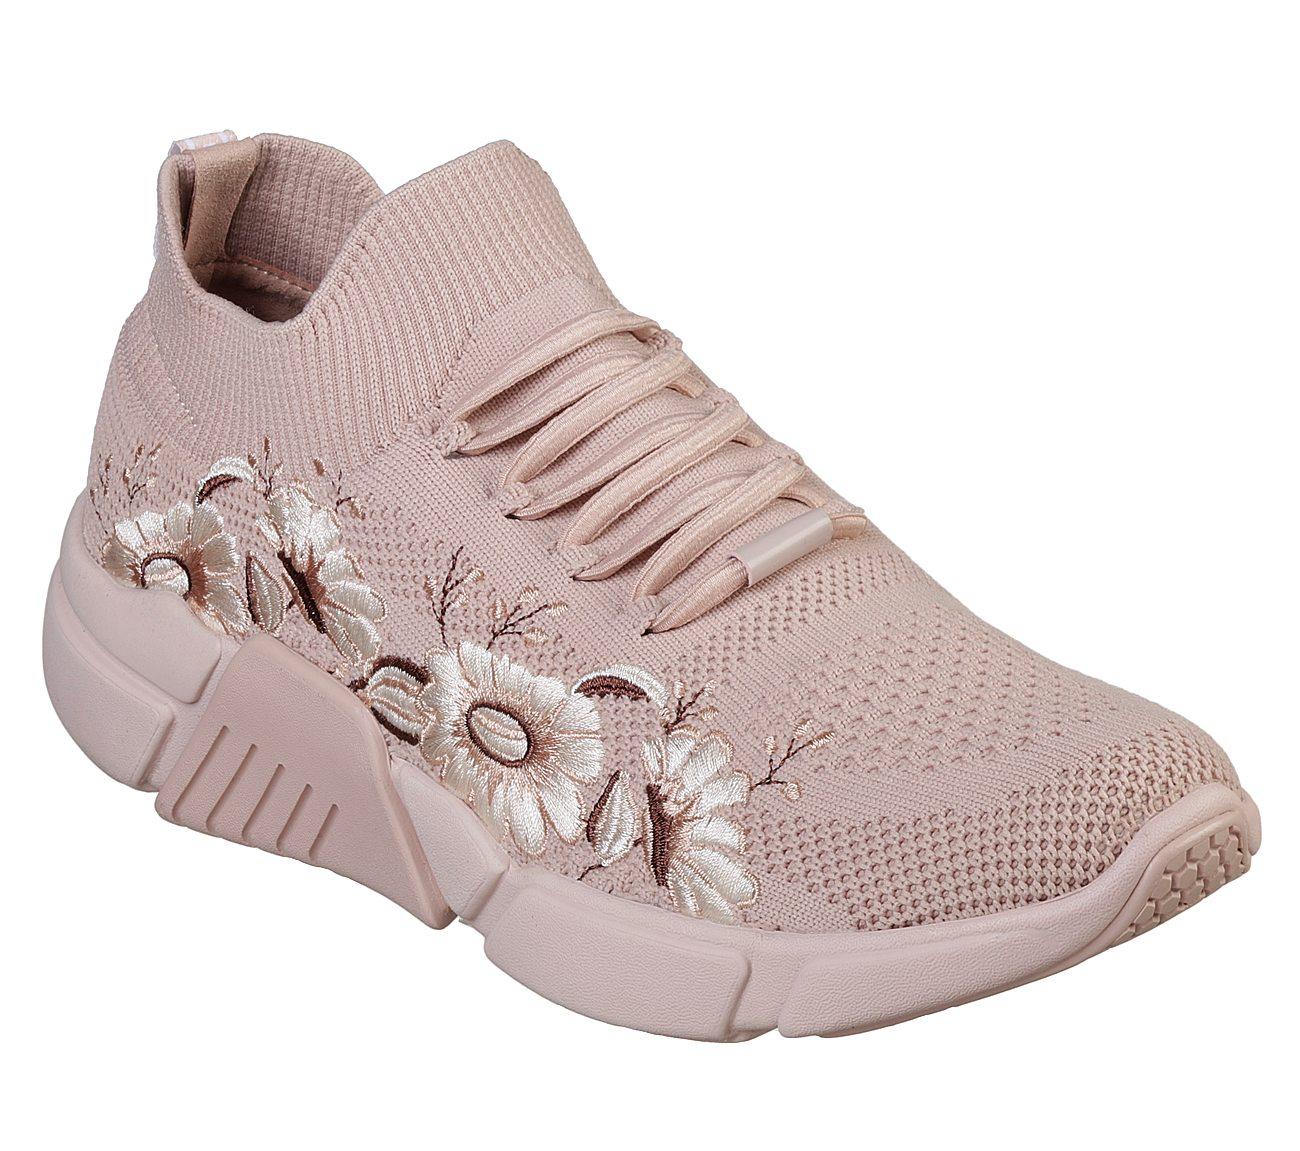 Block - Poppy Slip-On Sneakers Shoes